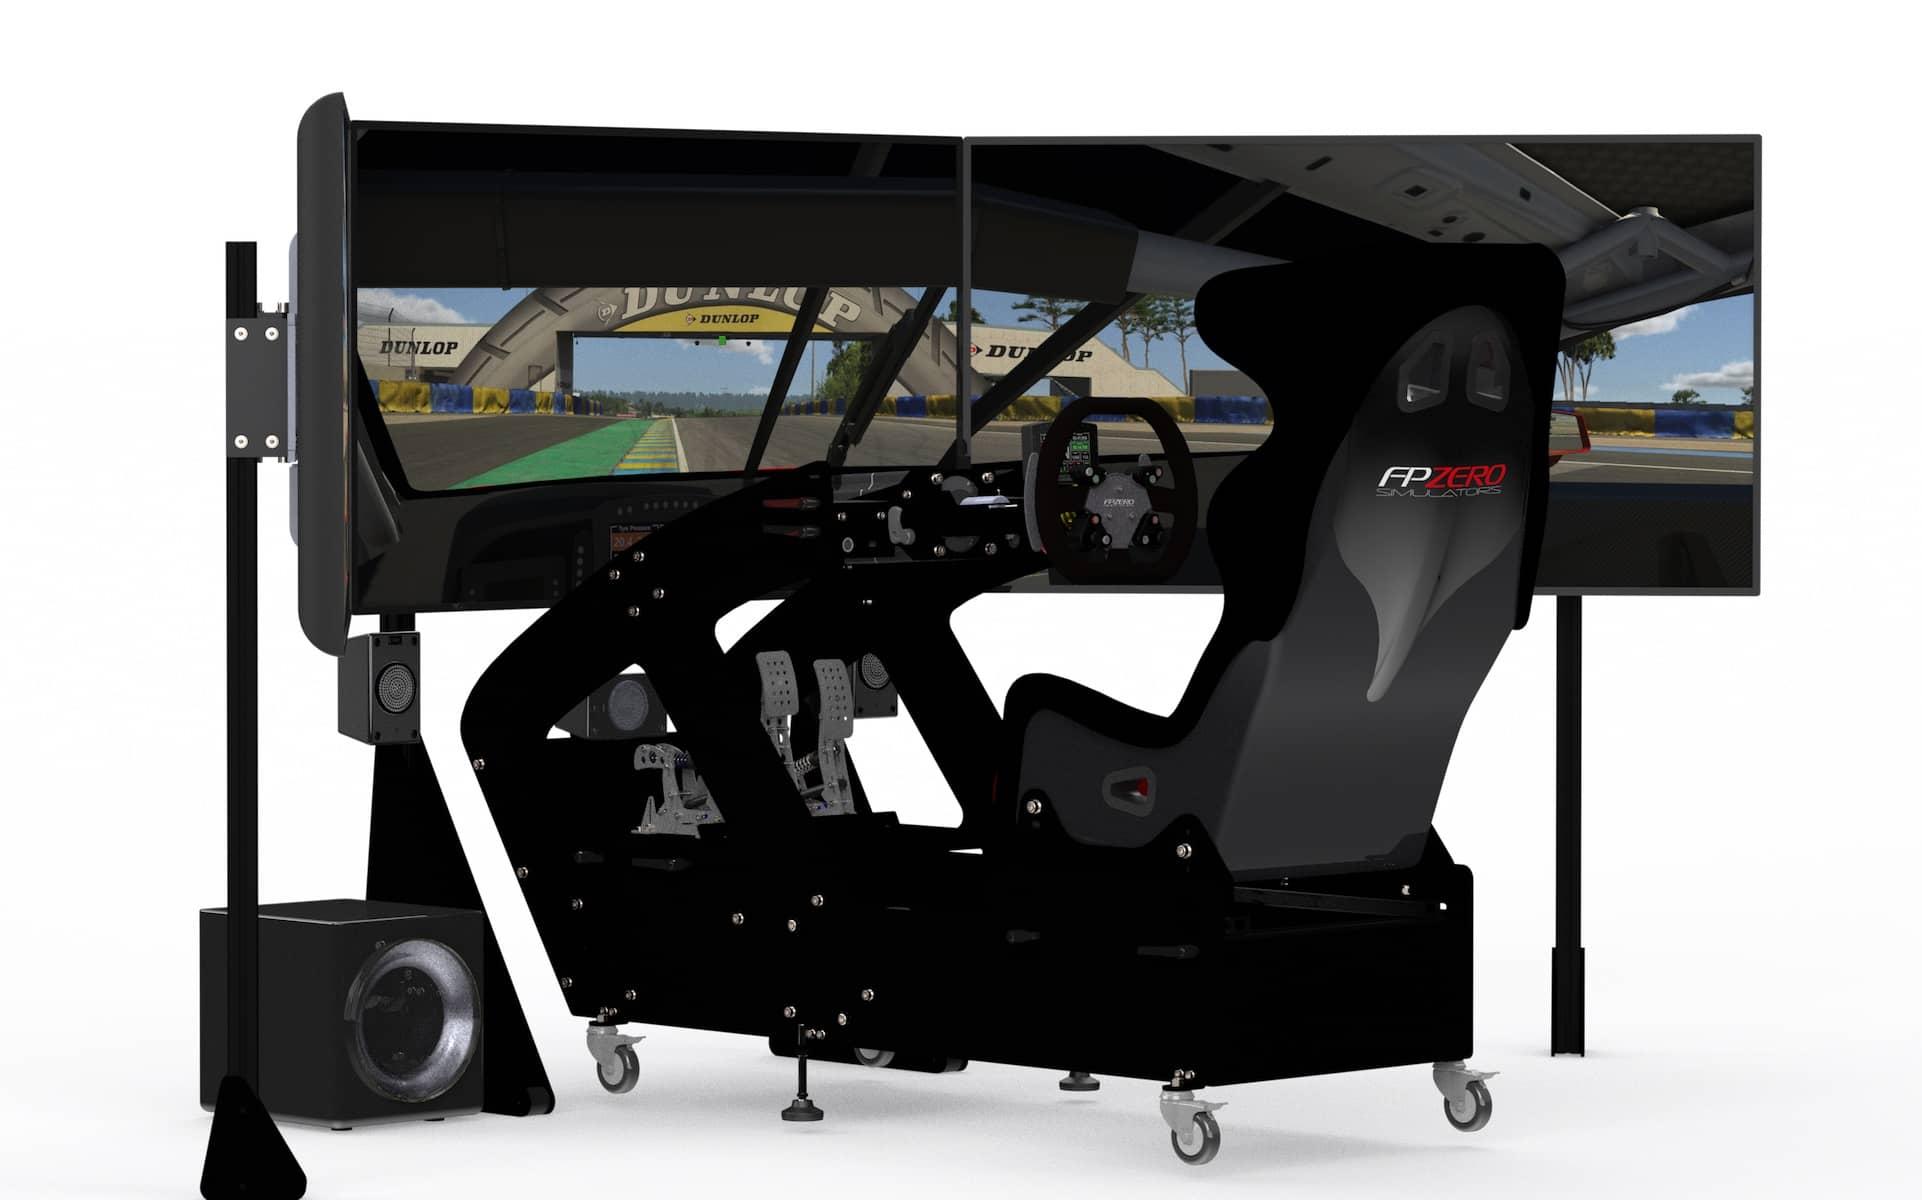 FPZERO Pro II GT Simulator with 55 screens